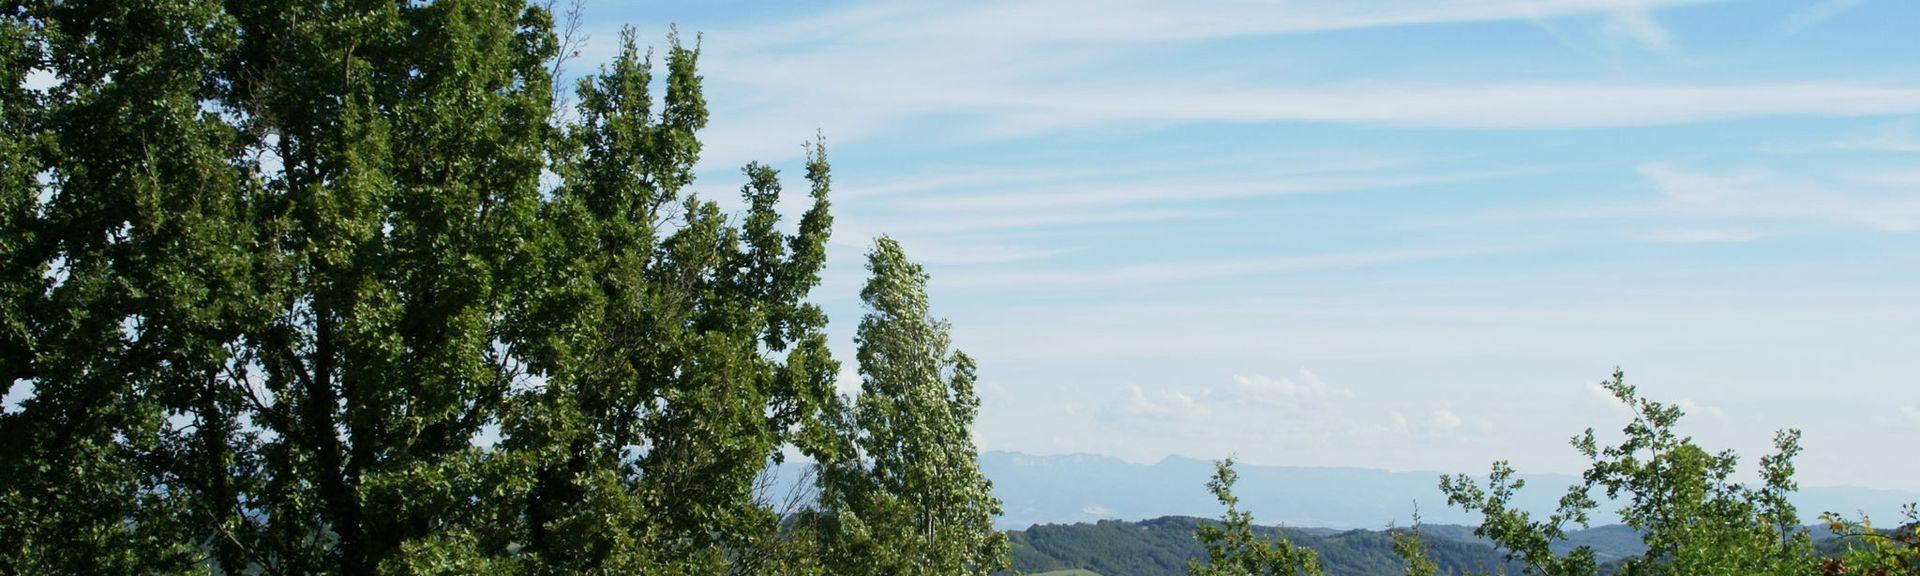 Charmes-sur-l'Herbasse, Auvergne-Rhône-Alpes, Frankrike